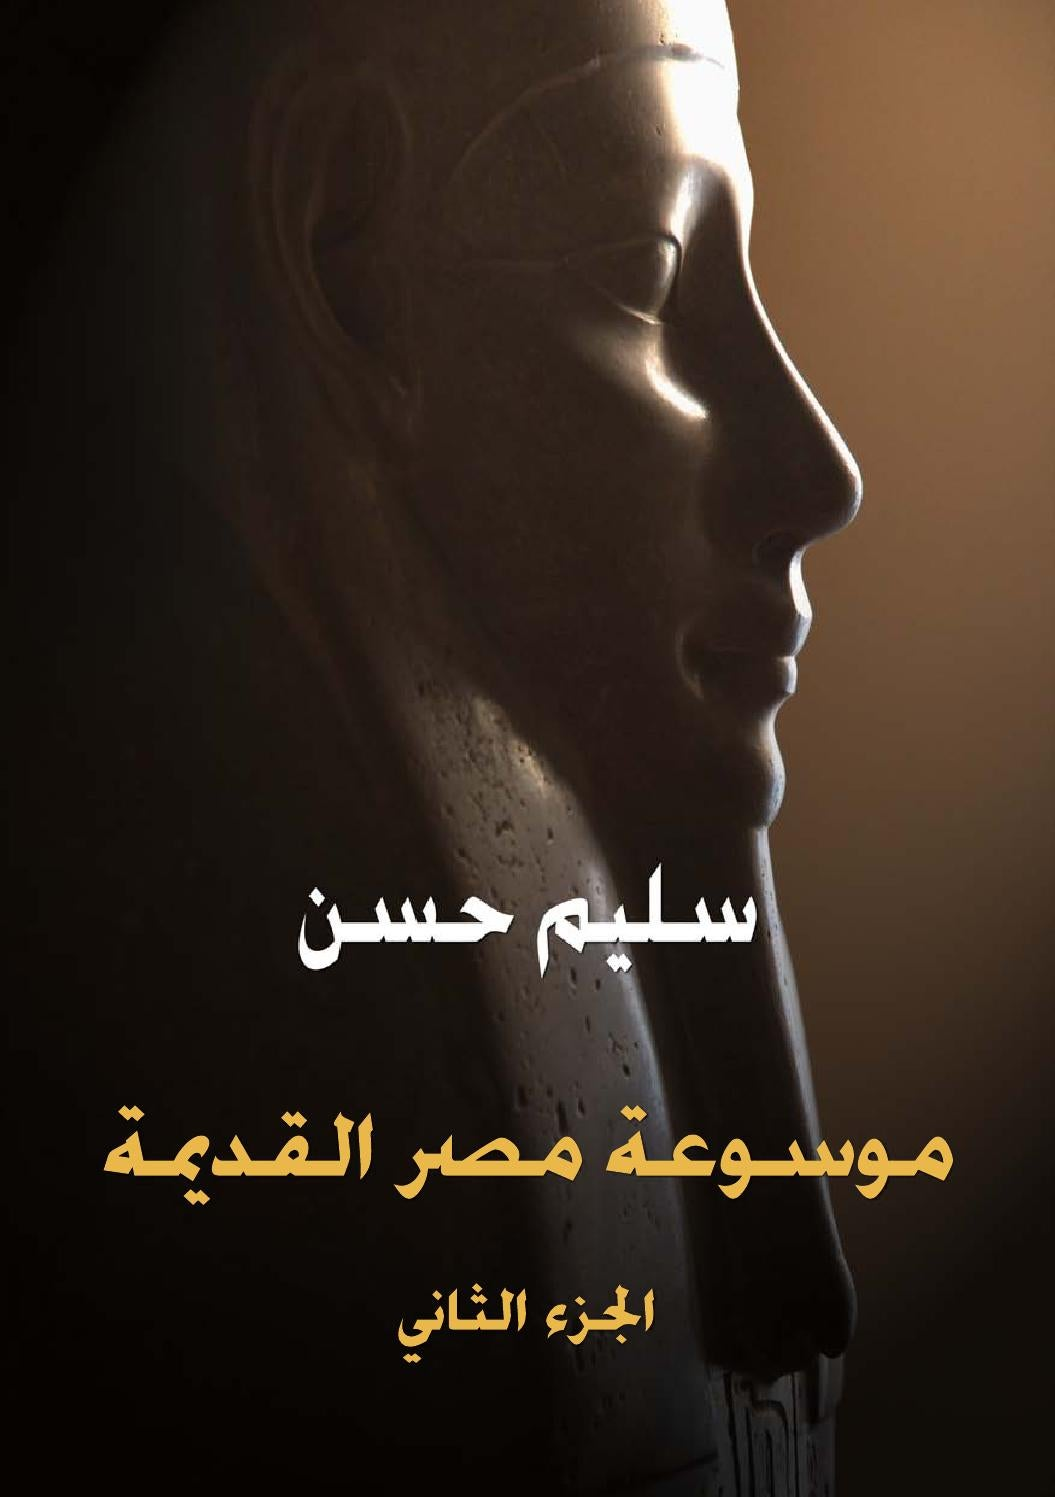 4c71e9421 موسوعة مصر القديمة - الجزء الثاني by Dahy Al Gharieb - issuu